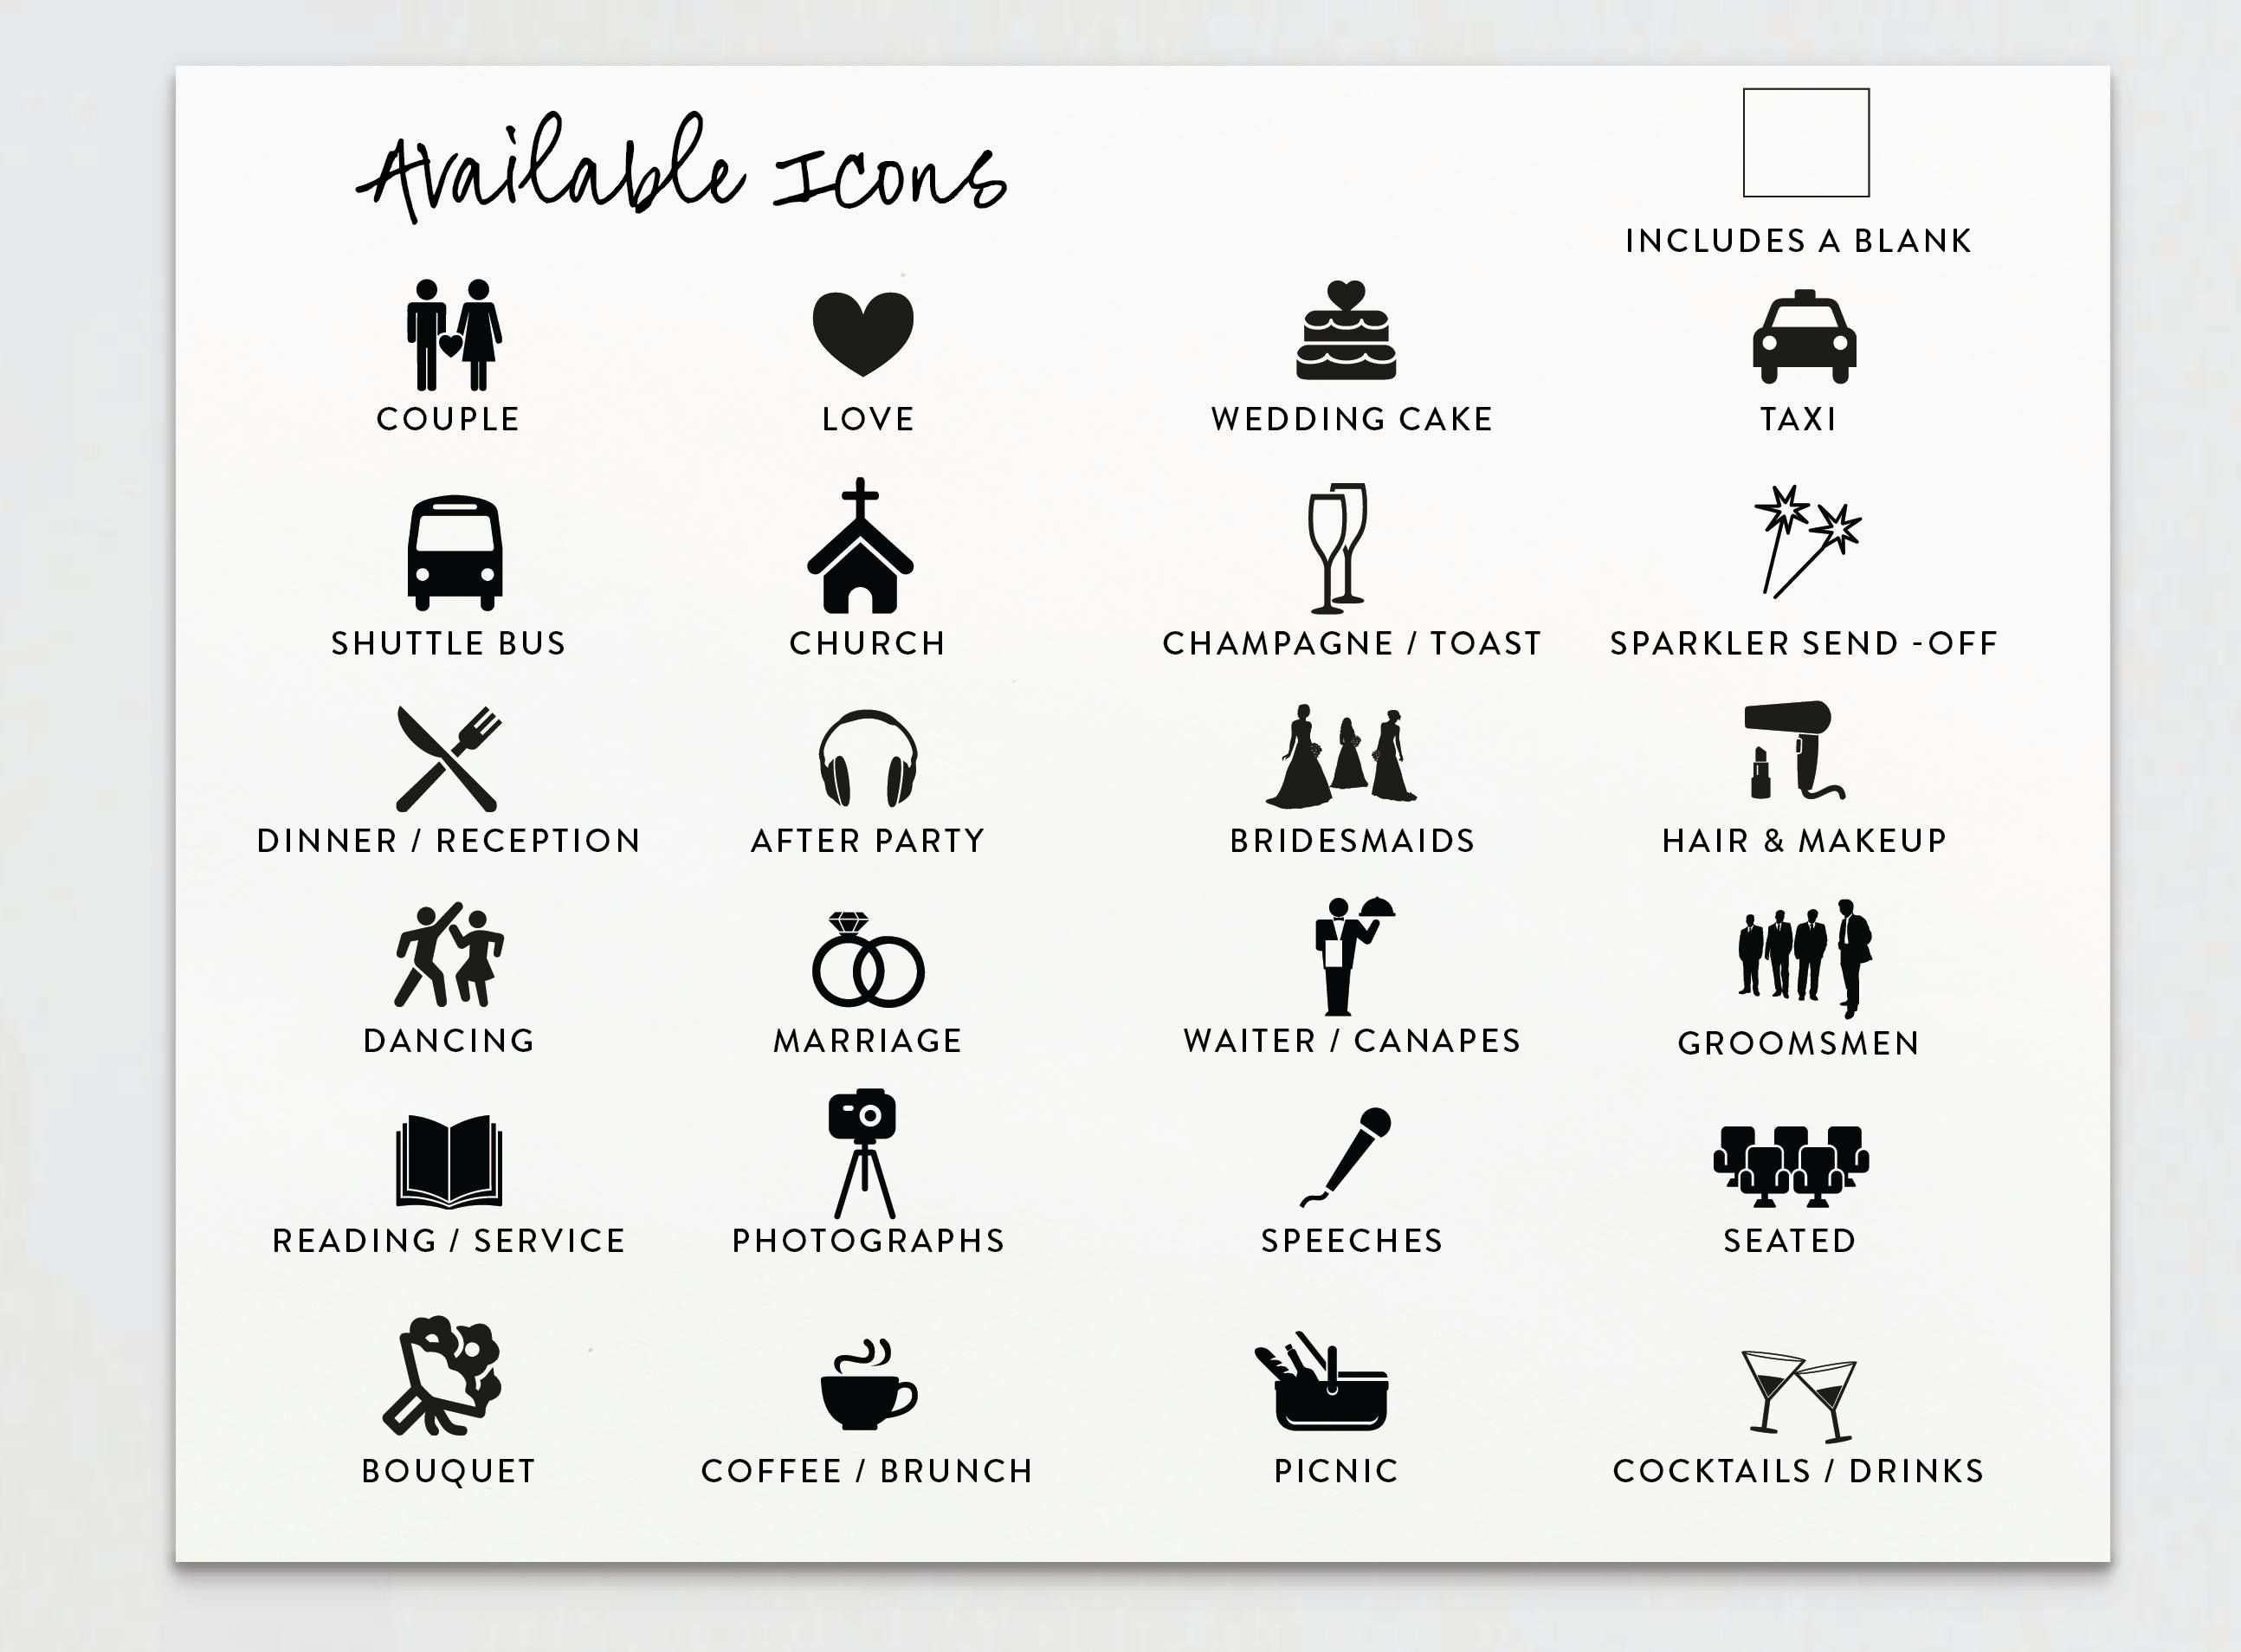 Wedding Timeline Wedding Schedule With Icons Studio Nellcote